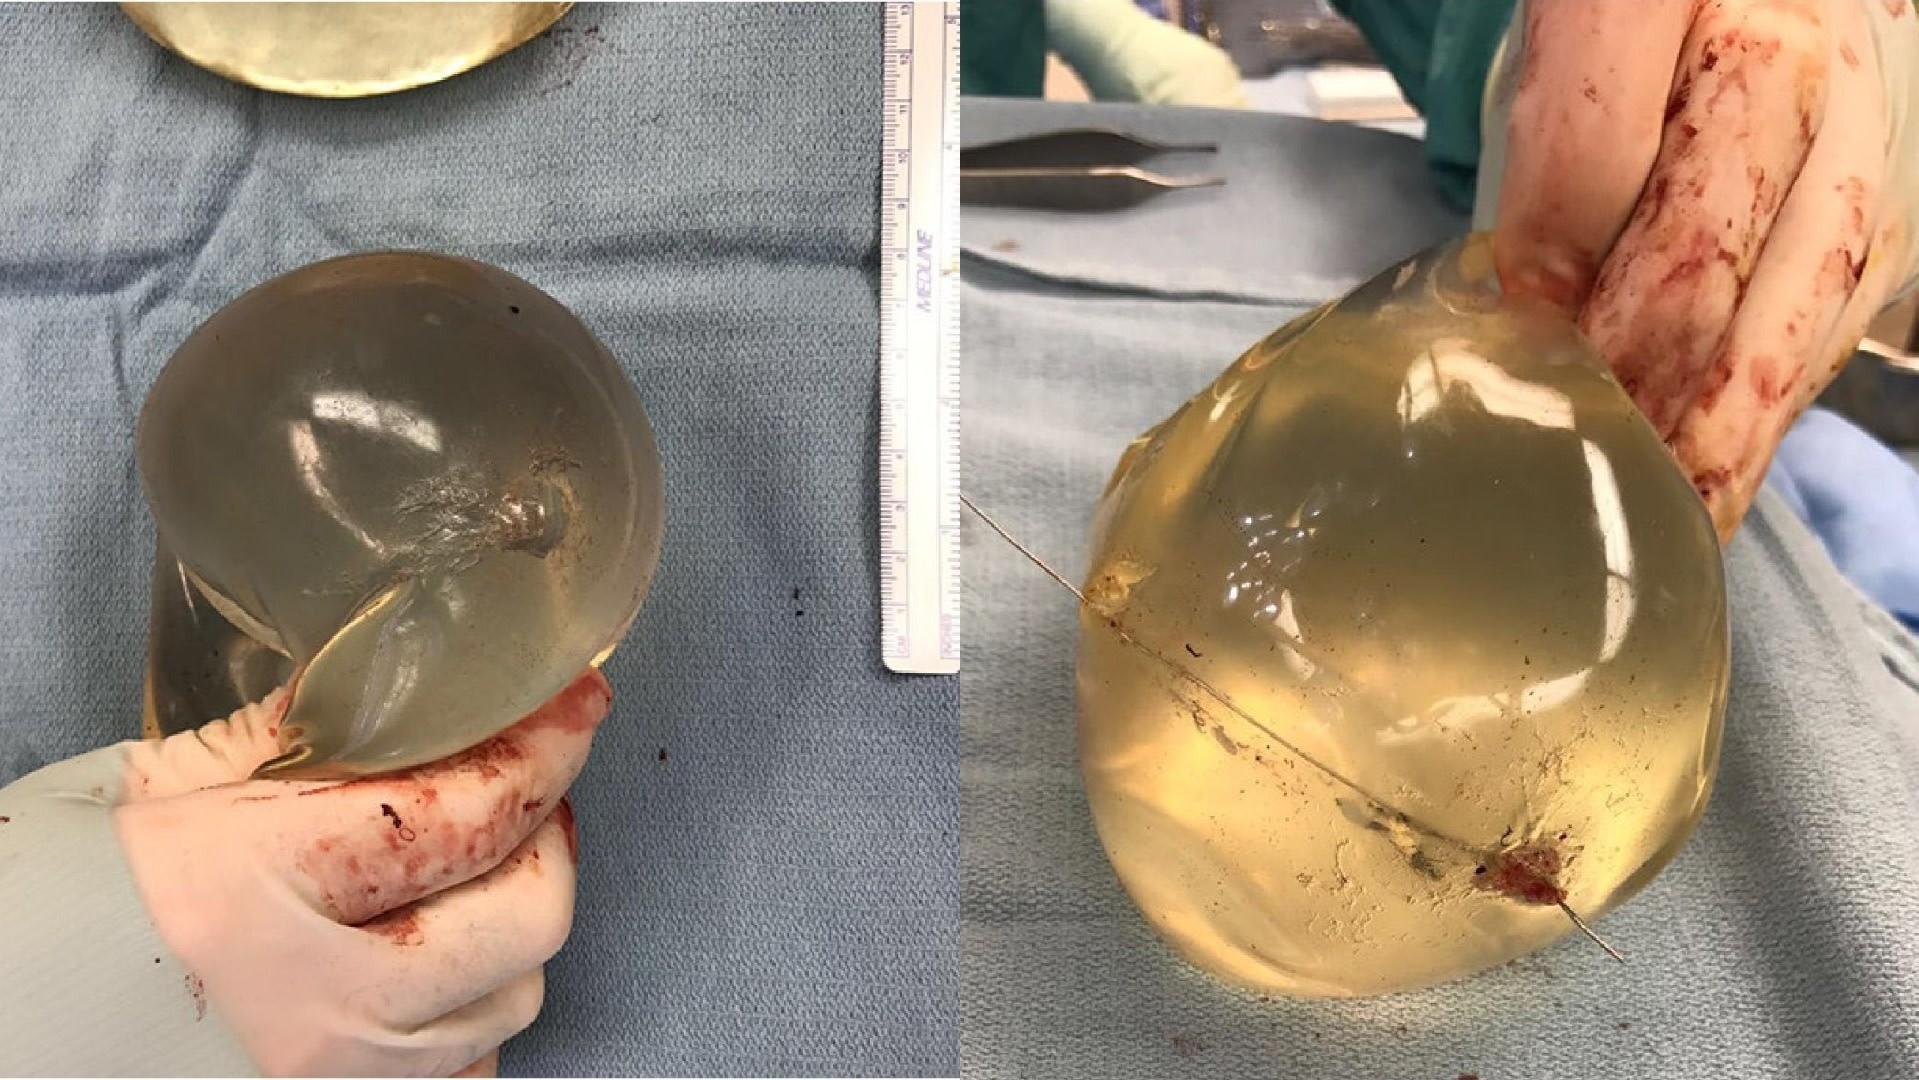 (Plastic Surgery Case Studies/Reprodução)